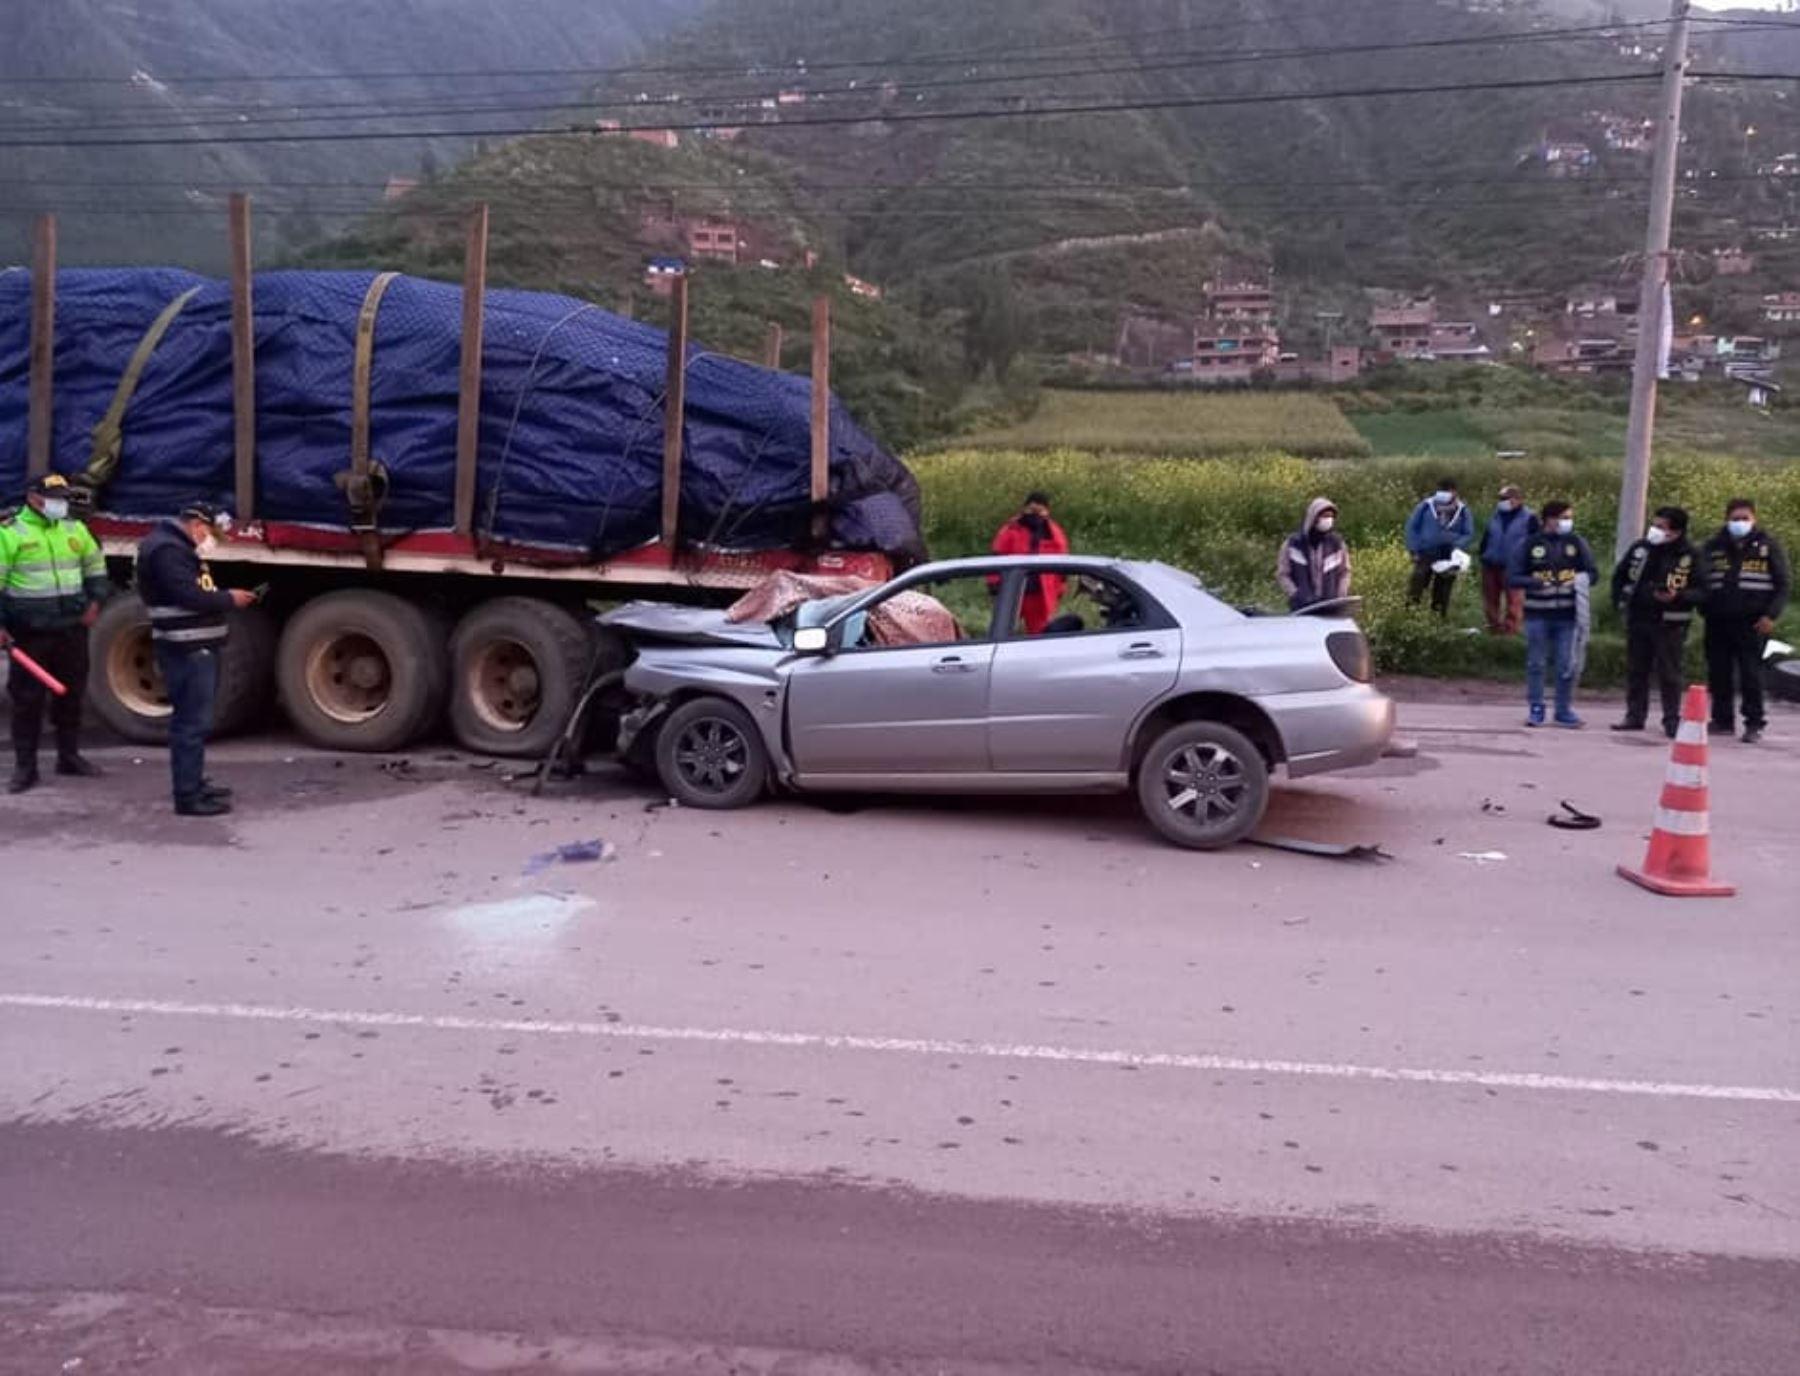 Policía muere en Cusco a causa de lamentable accidente de tránsito ocurrido en la carretera Cusco-Arequipa. ANDINA/Difusión